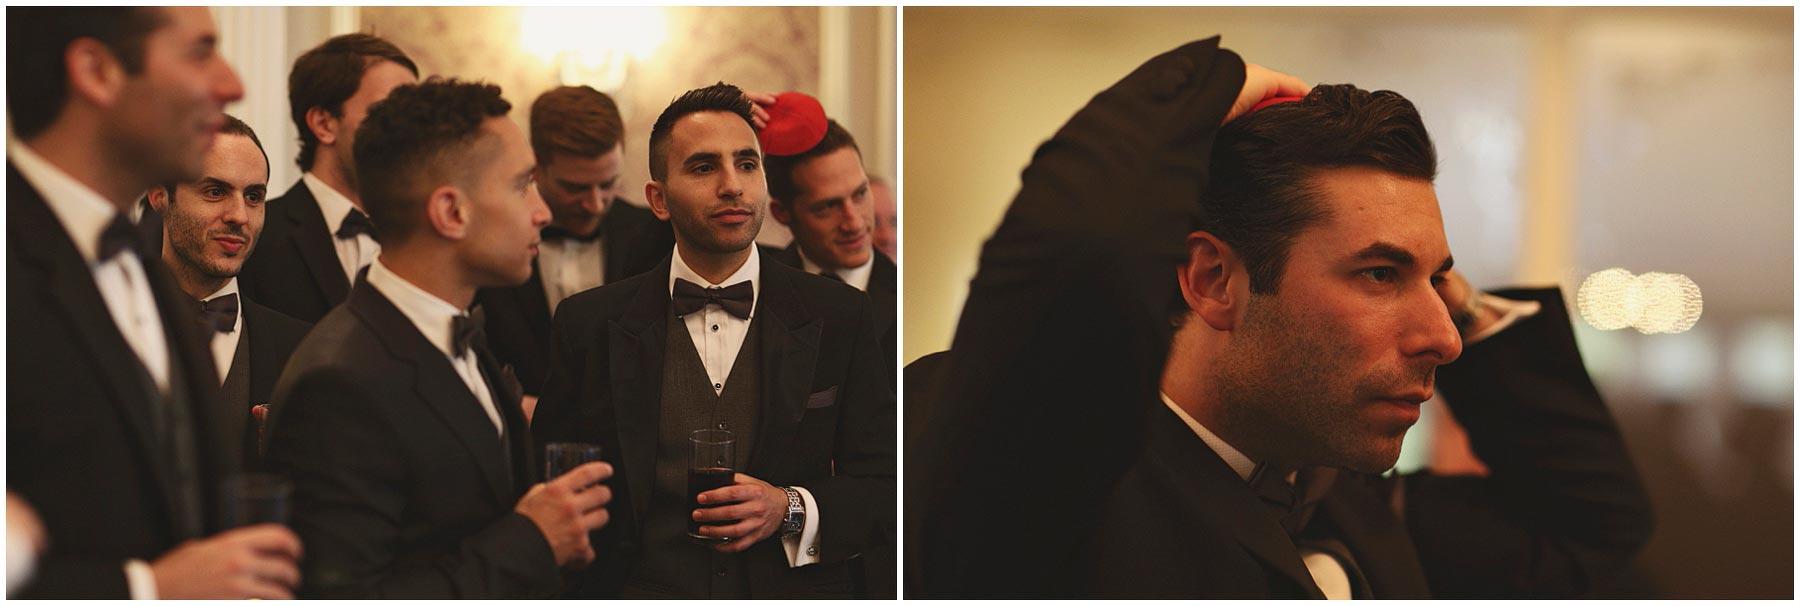 Jewish-Wedding-Photography_0037